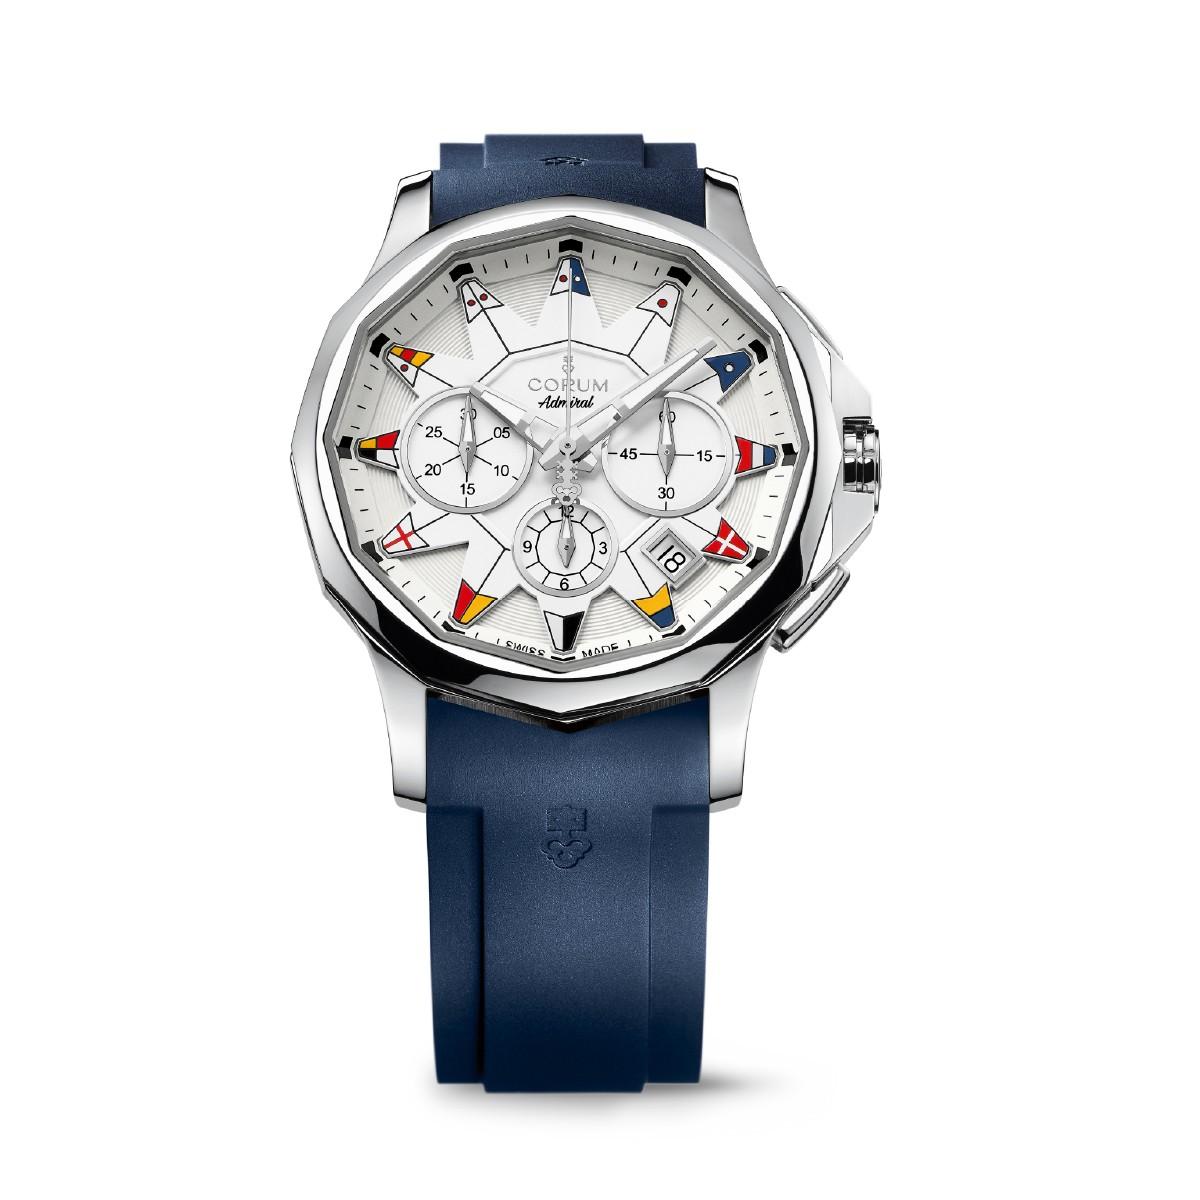 Produkt AdmiralLegend ChronographrefA Preis